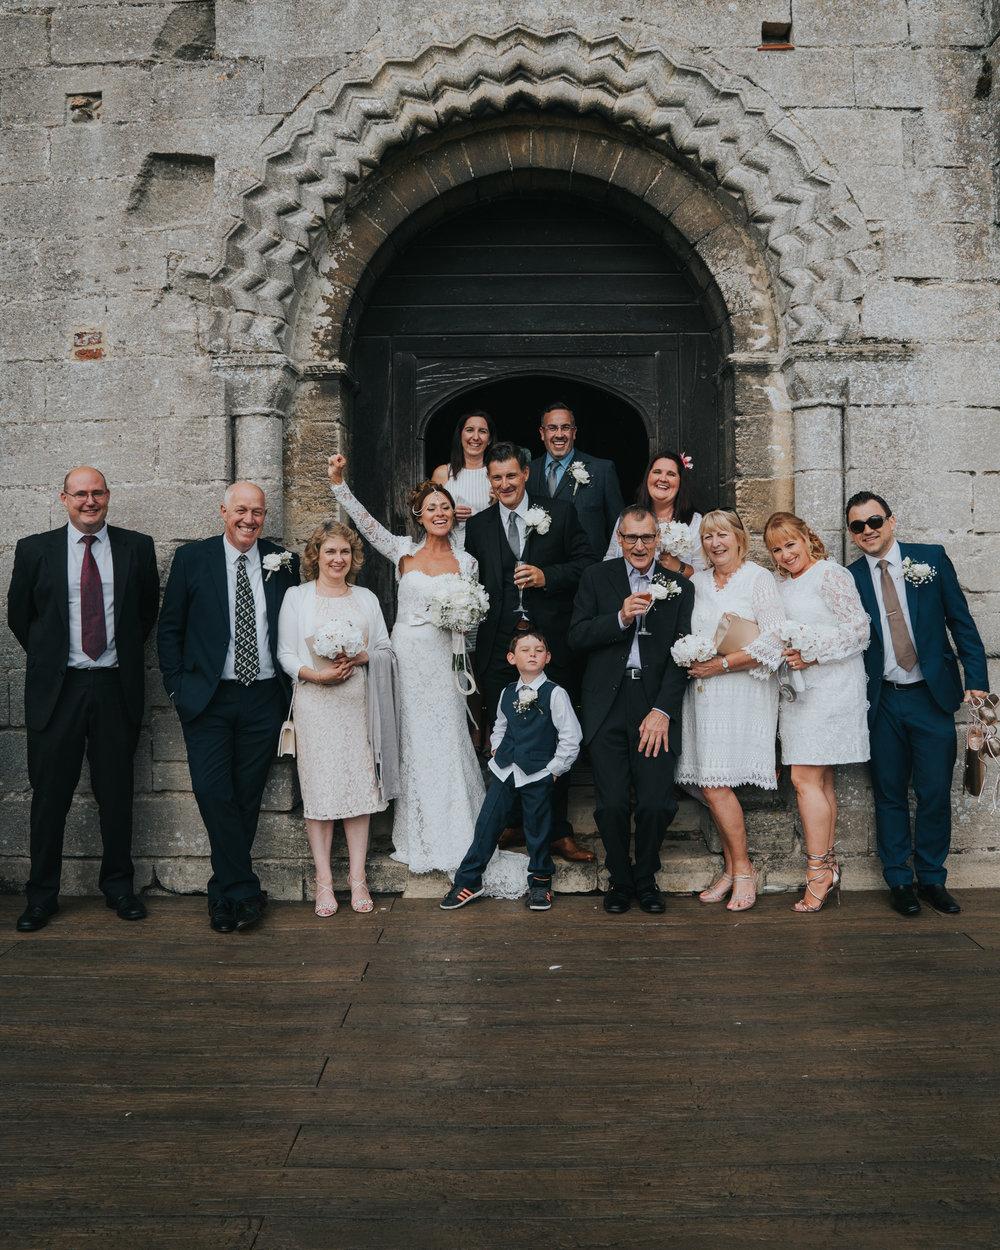 grace-elizabeth-boho-wedding-headingham-castle-essex-wedding-photographer-59.jpg